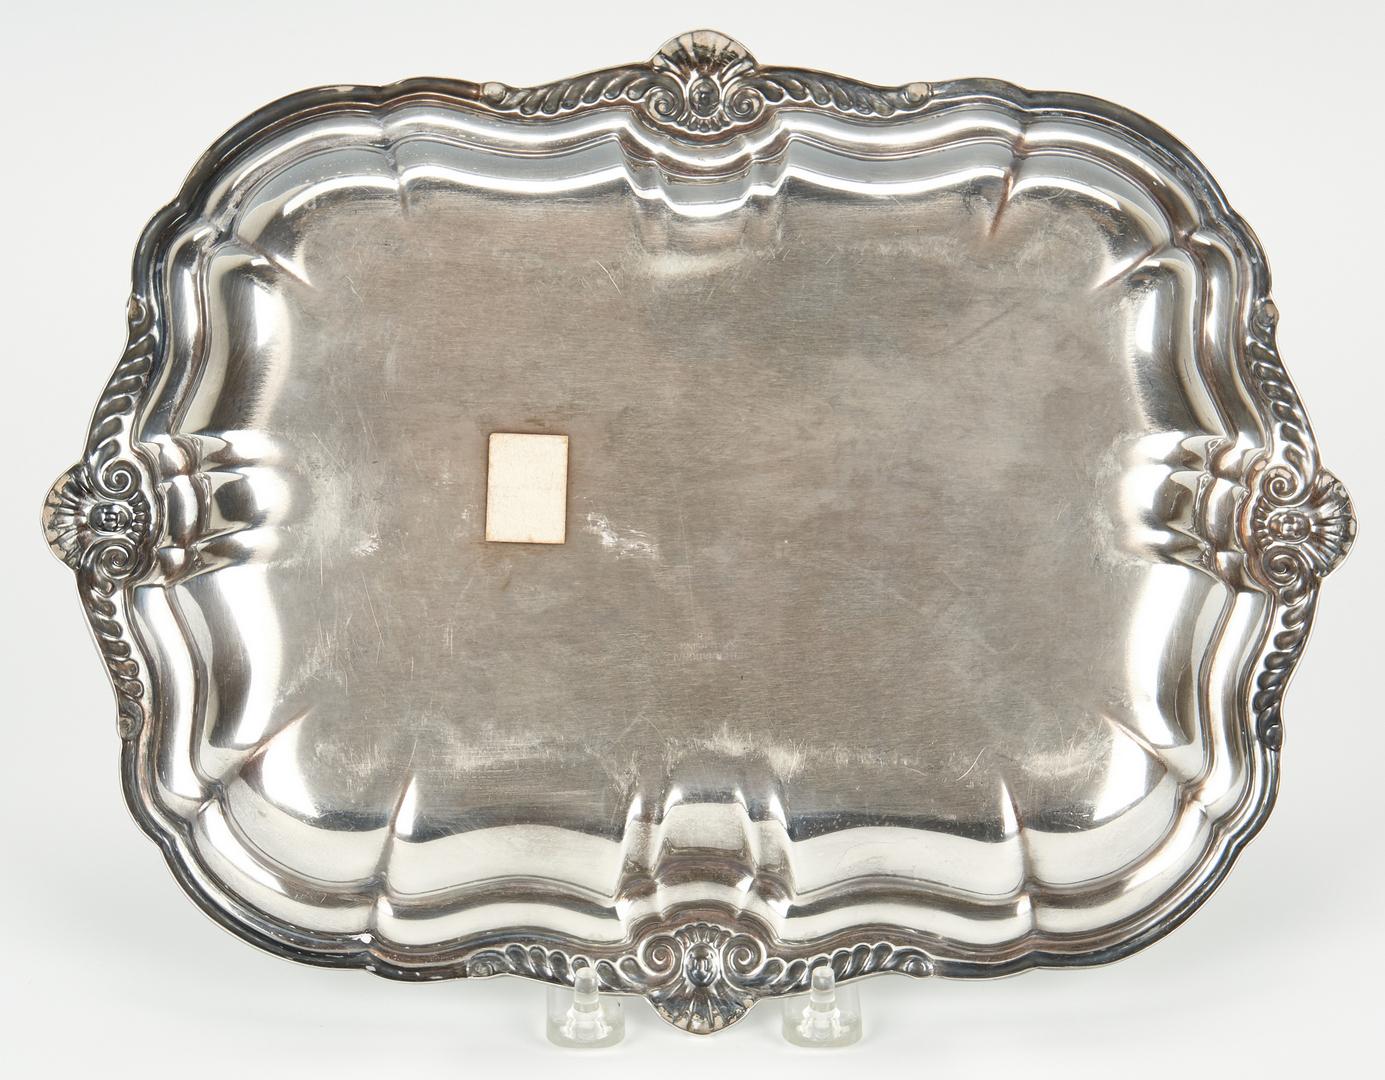 Lot 1037: International Sterling Silver Oblong Tray